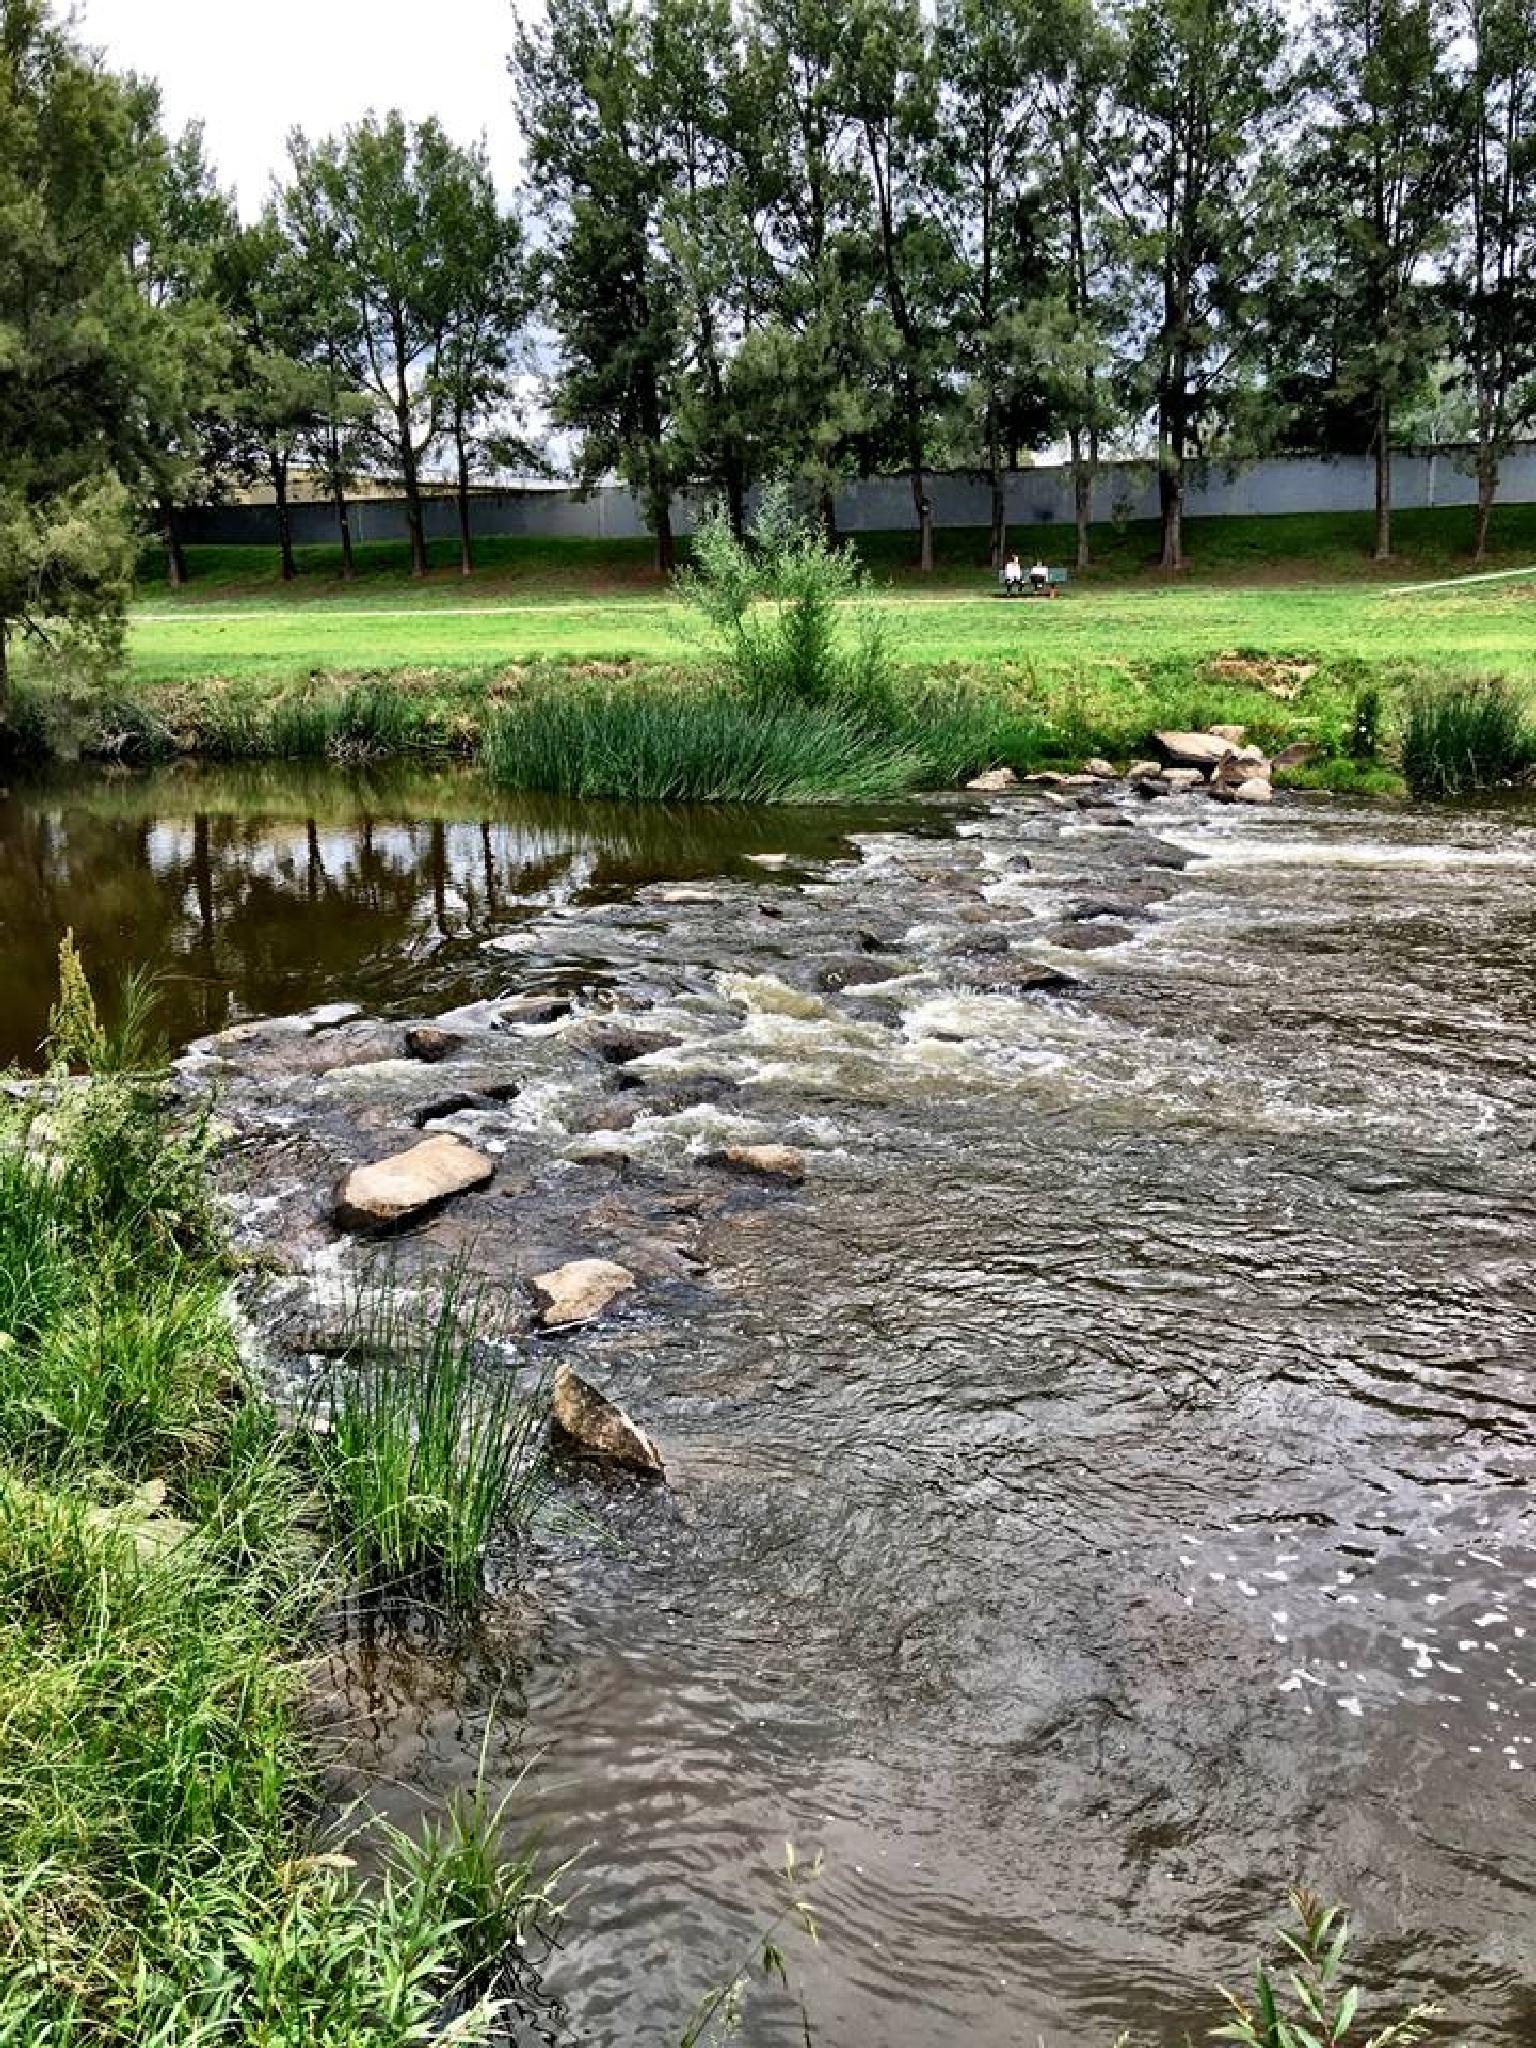 The Beautifully Green Macquarie River Park by valli.hemp